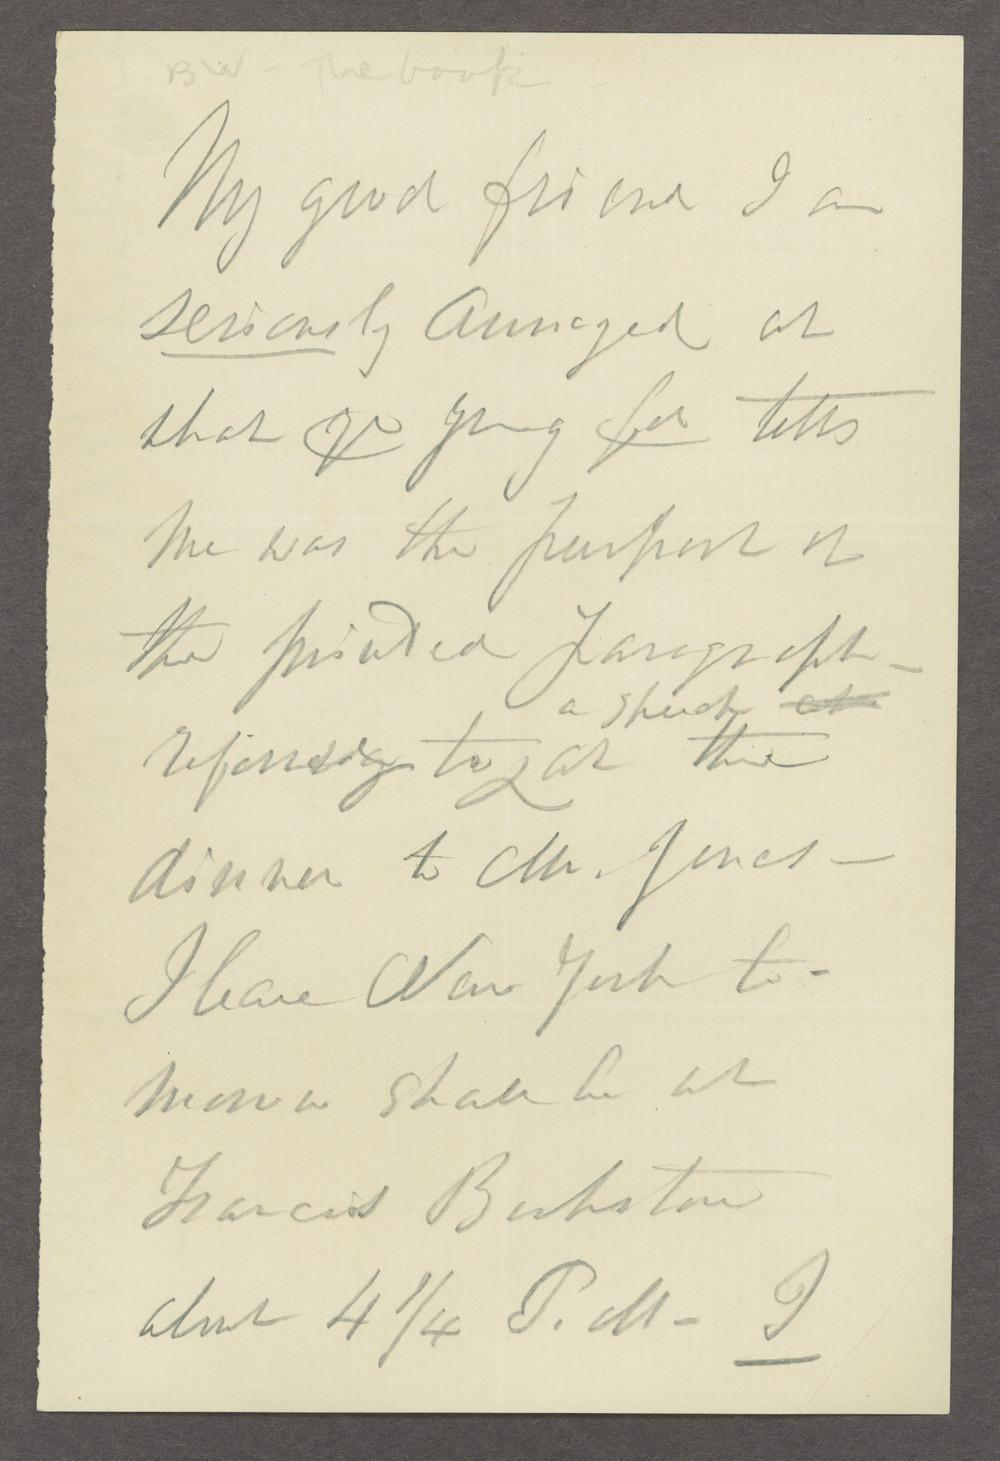 Dorothea Dix correspondence - 1 [Box 1 Folder 5]